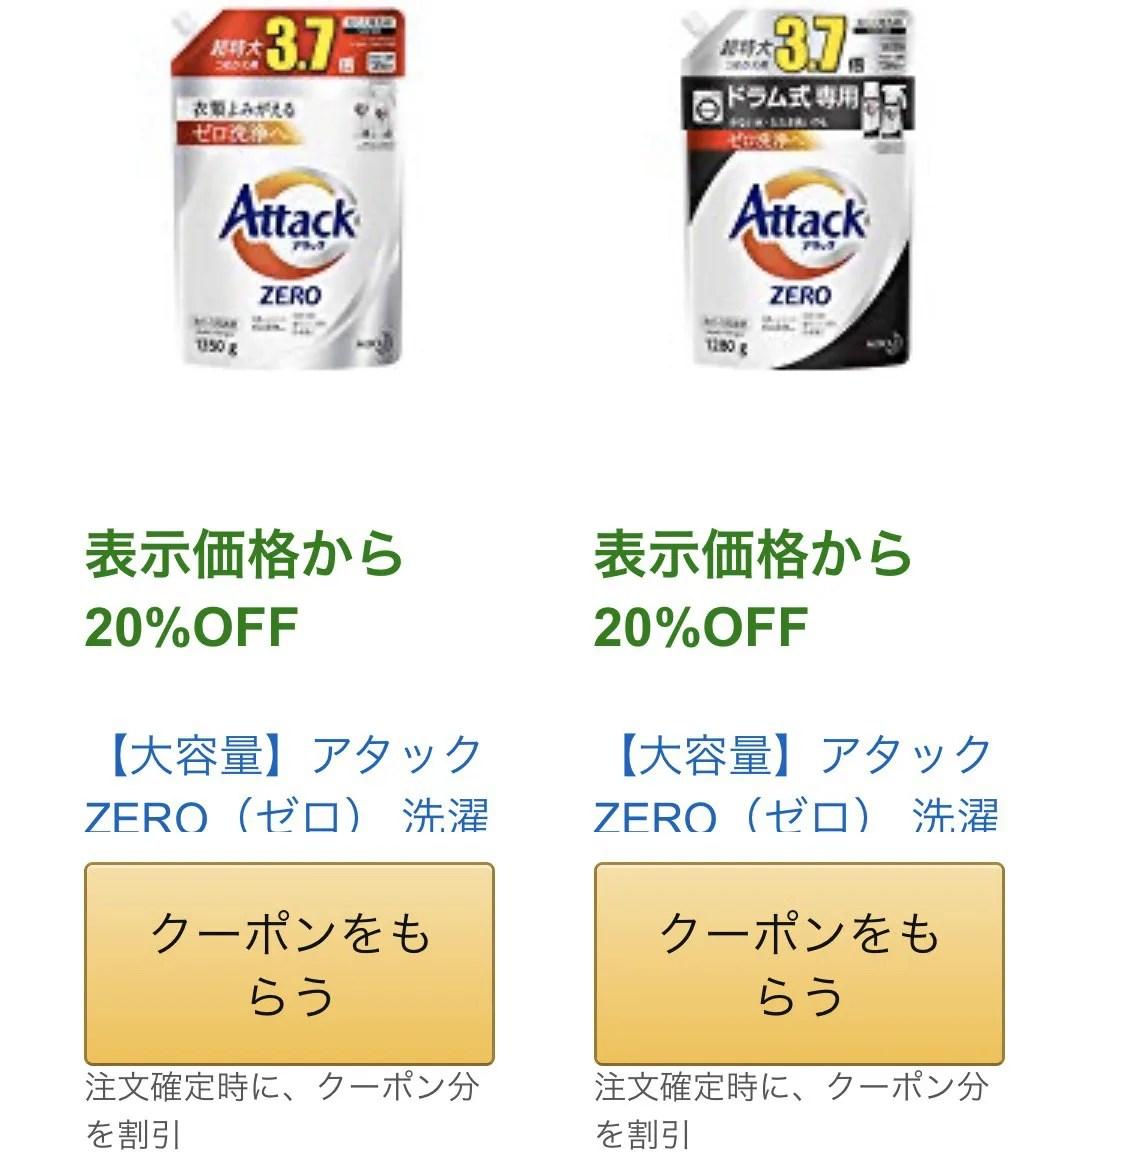 Amazonファミリー 登録者限定セール内容④